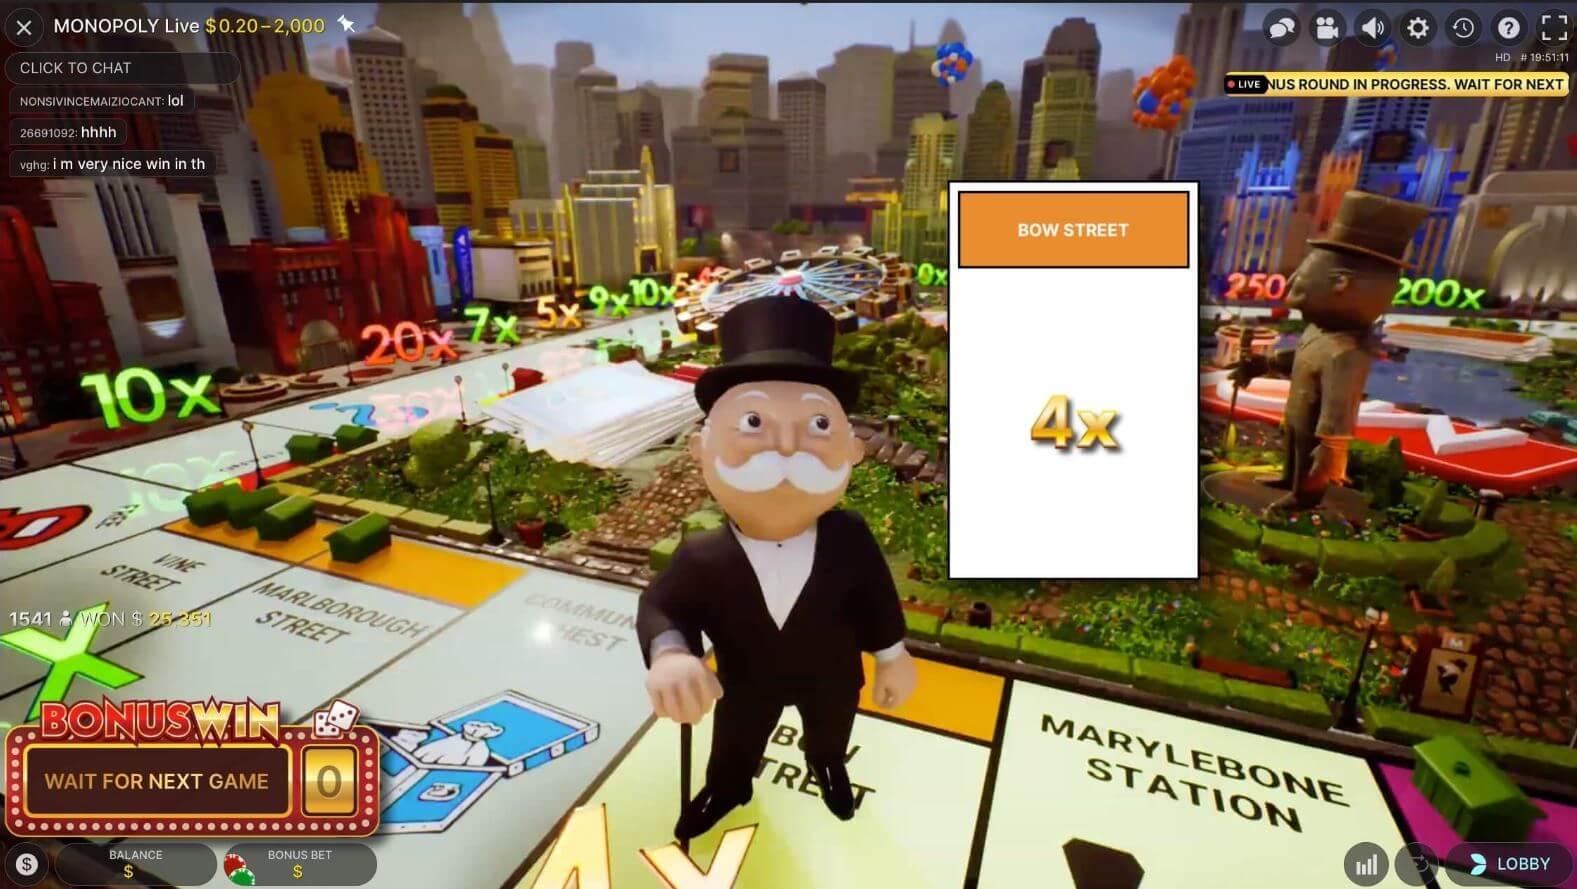 Monopoly Live bonusmultiplier